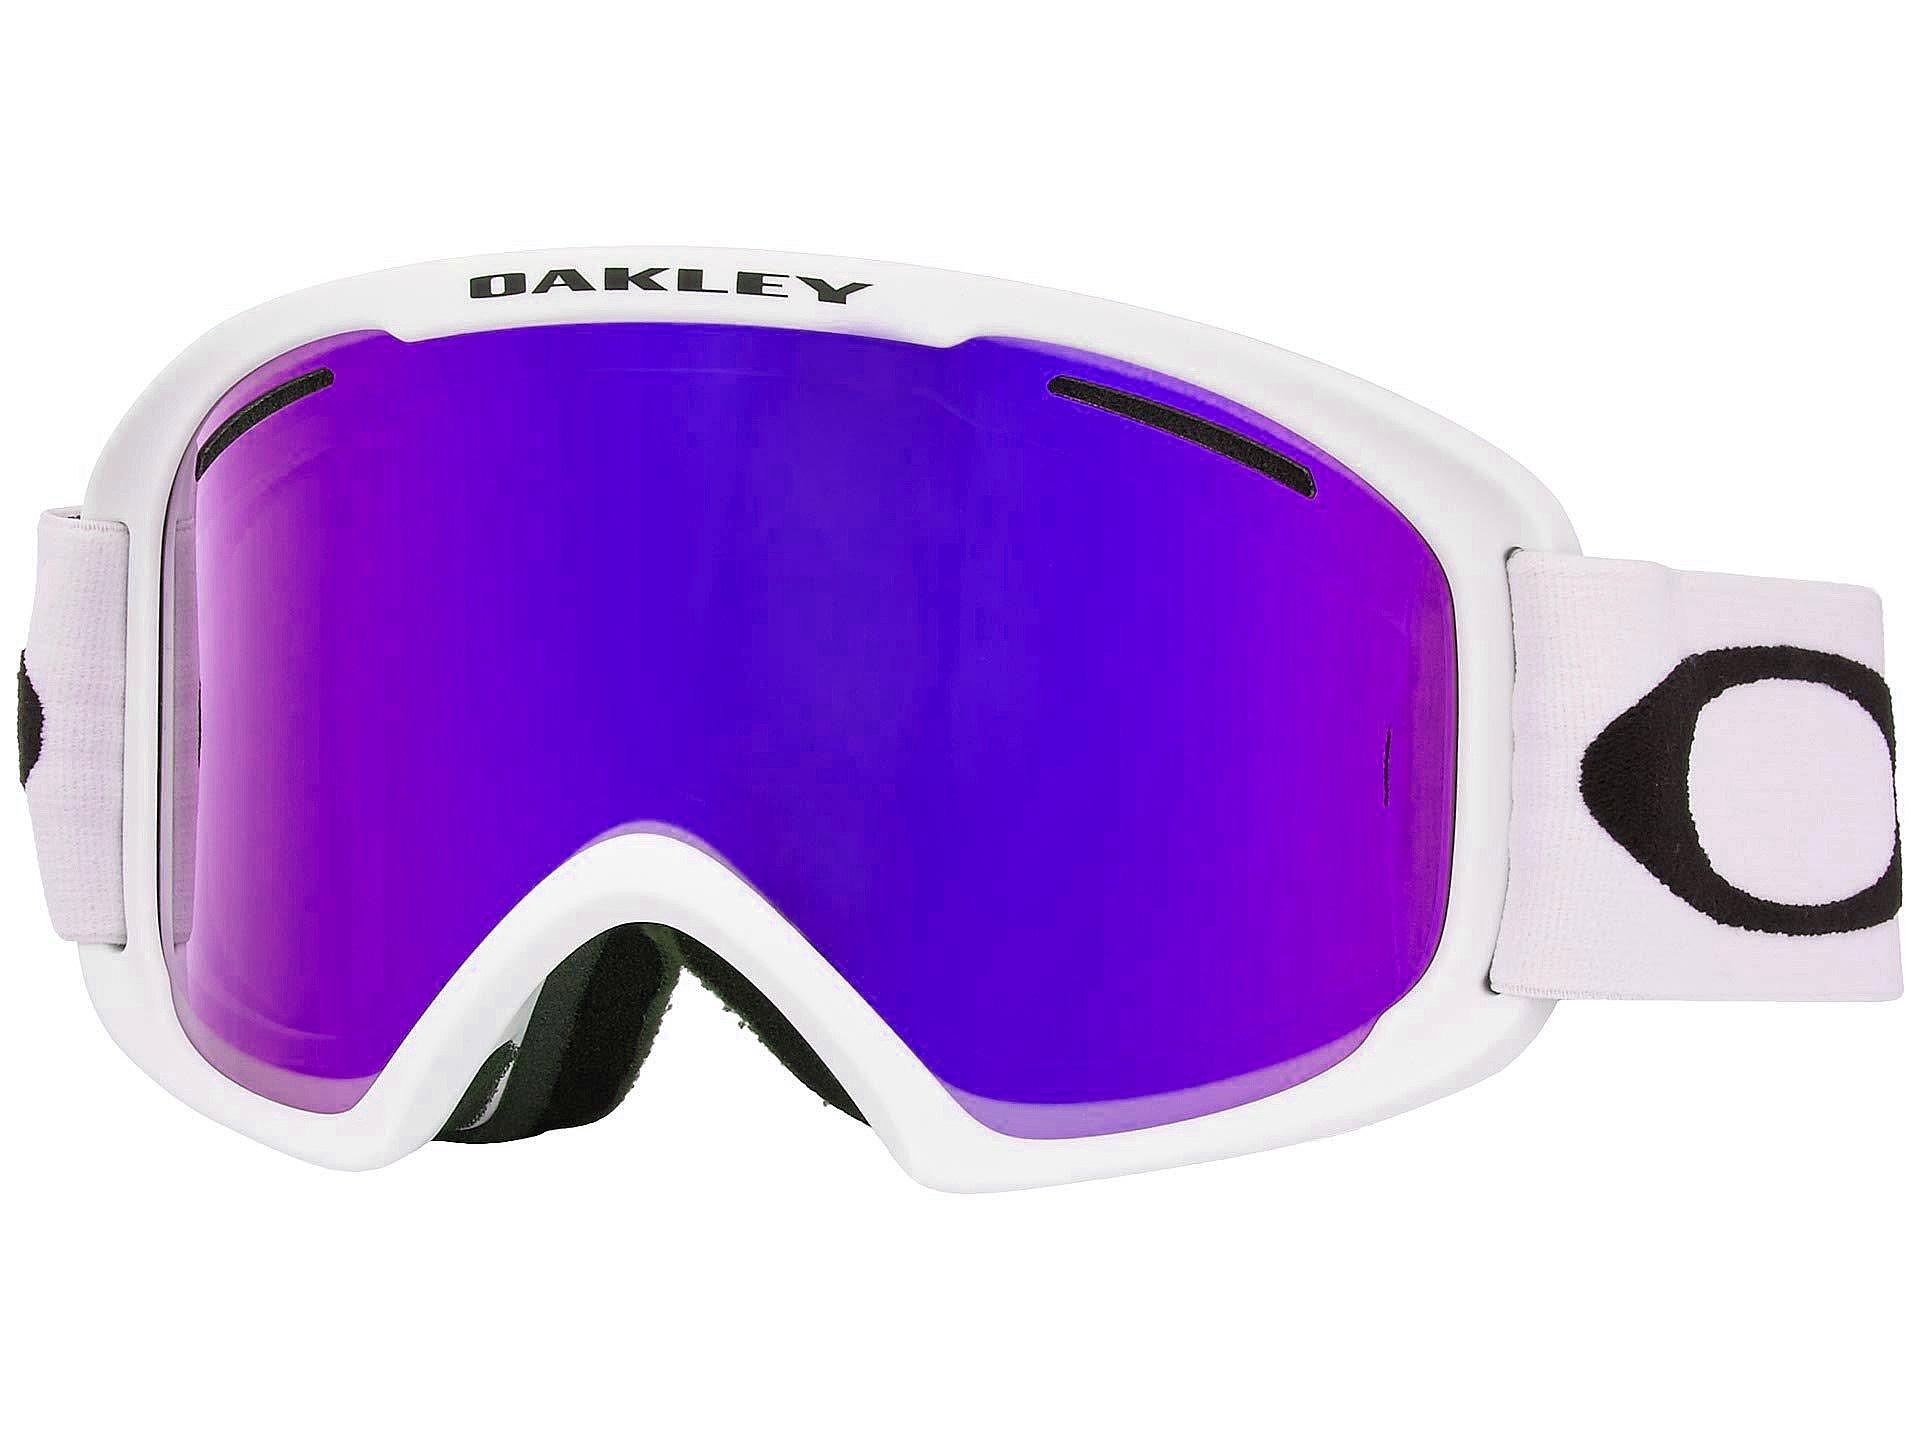 brýle Oakley O Frame 2.0 Pro XL - Matte White/Violet Iridium & Persimmon one size